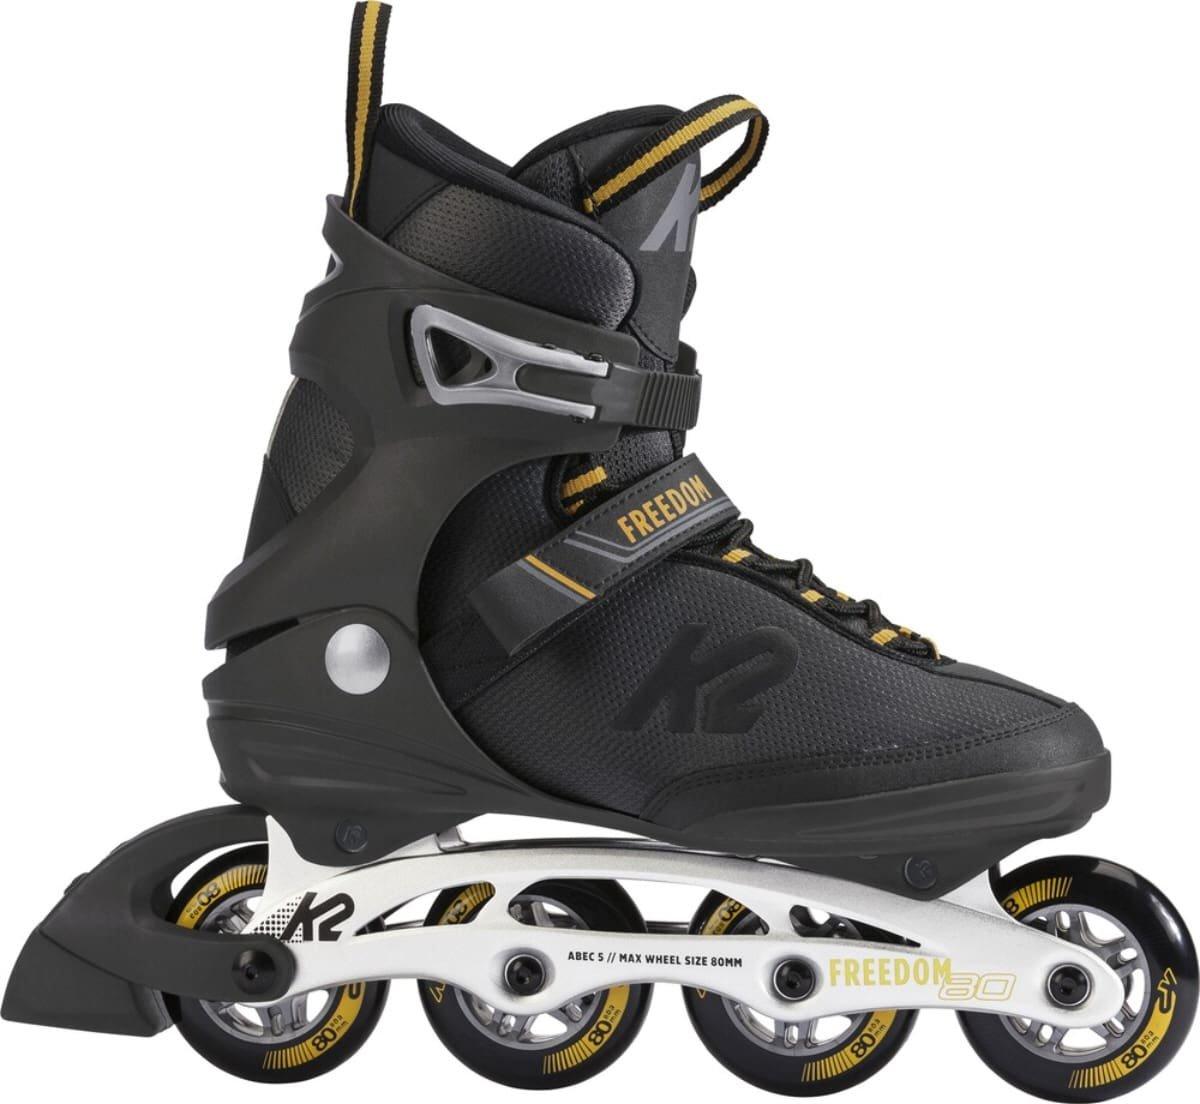 K2 Freedom Inline Skates 80mm M 41,5 EUR